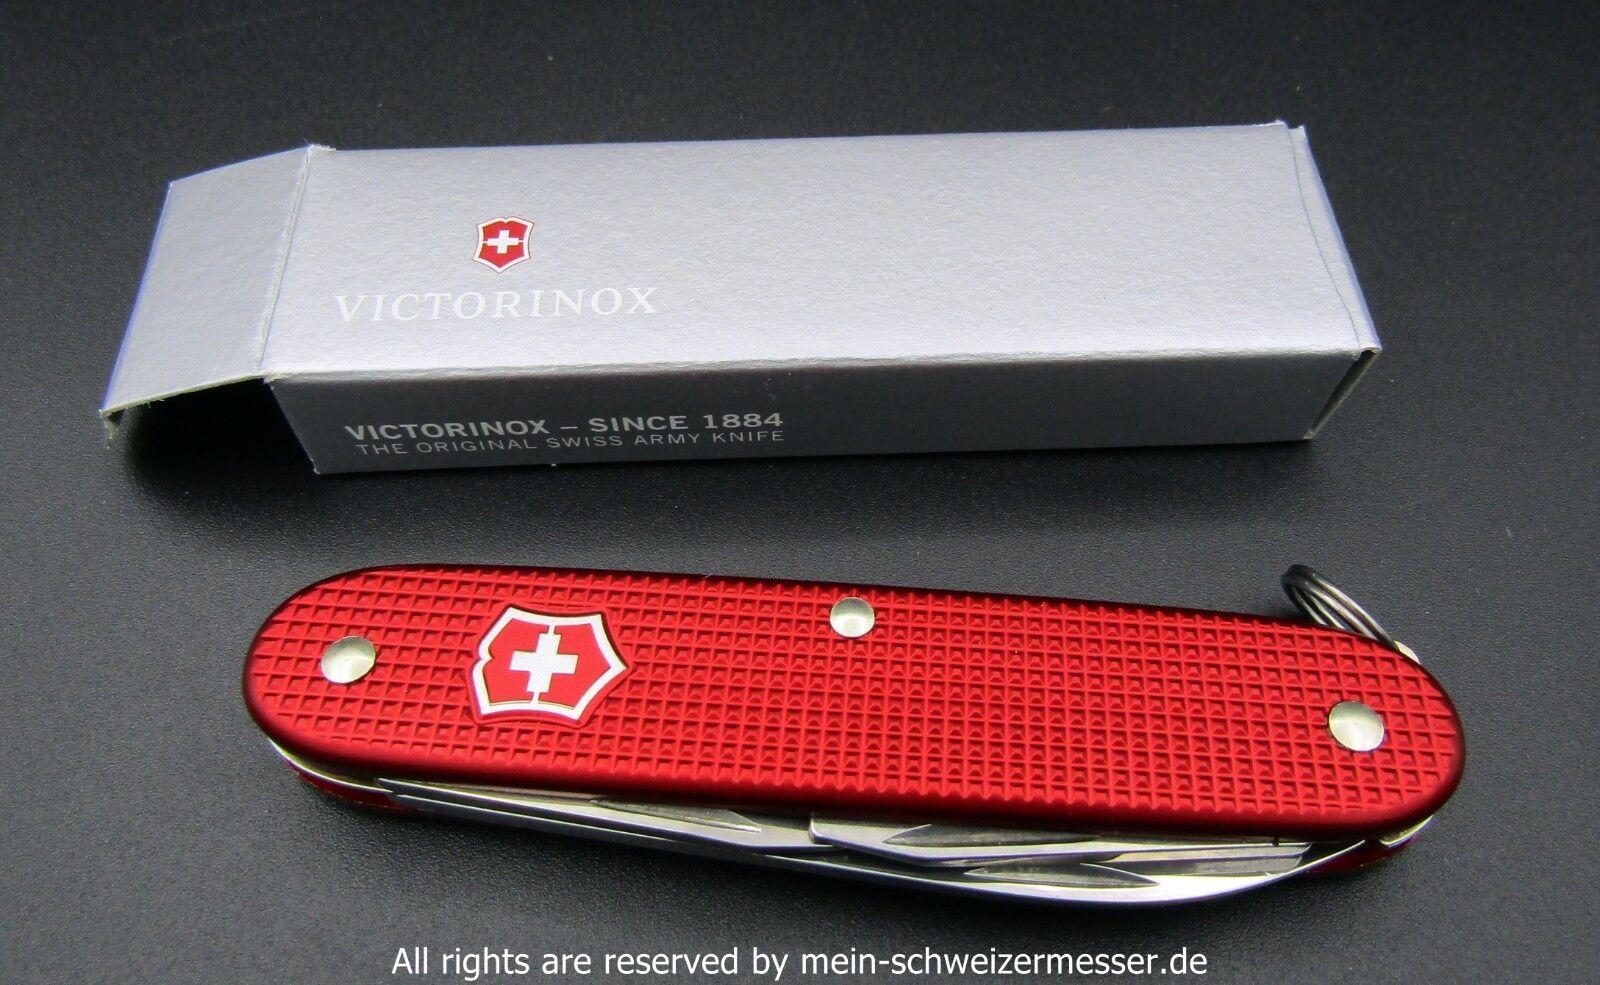 Navaja suiza, Victorinox Pioneer aseaa sghwr assaa, Swiss Army Knife